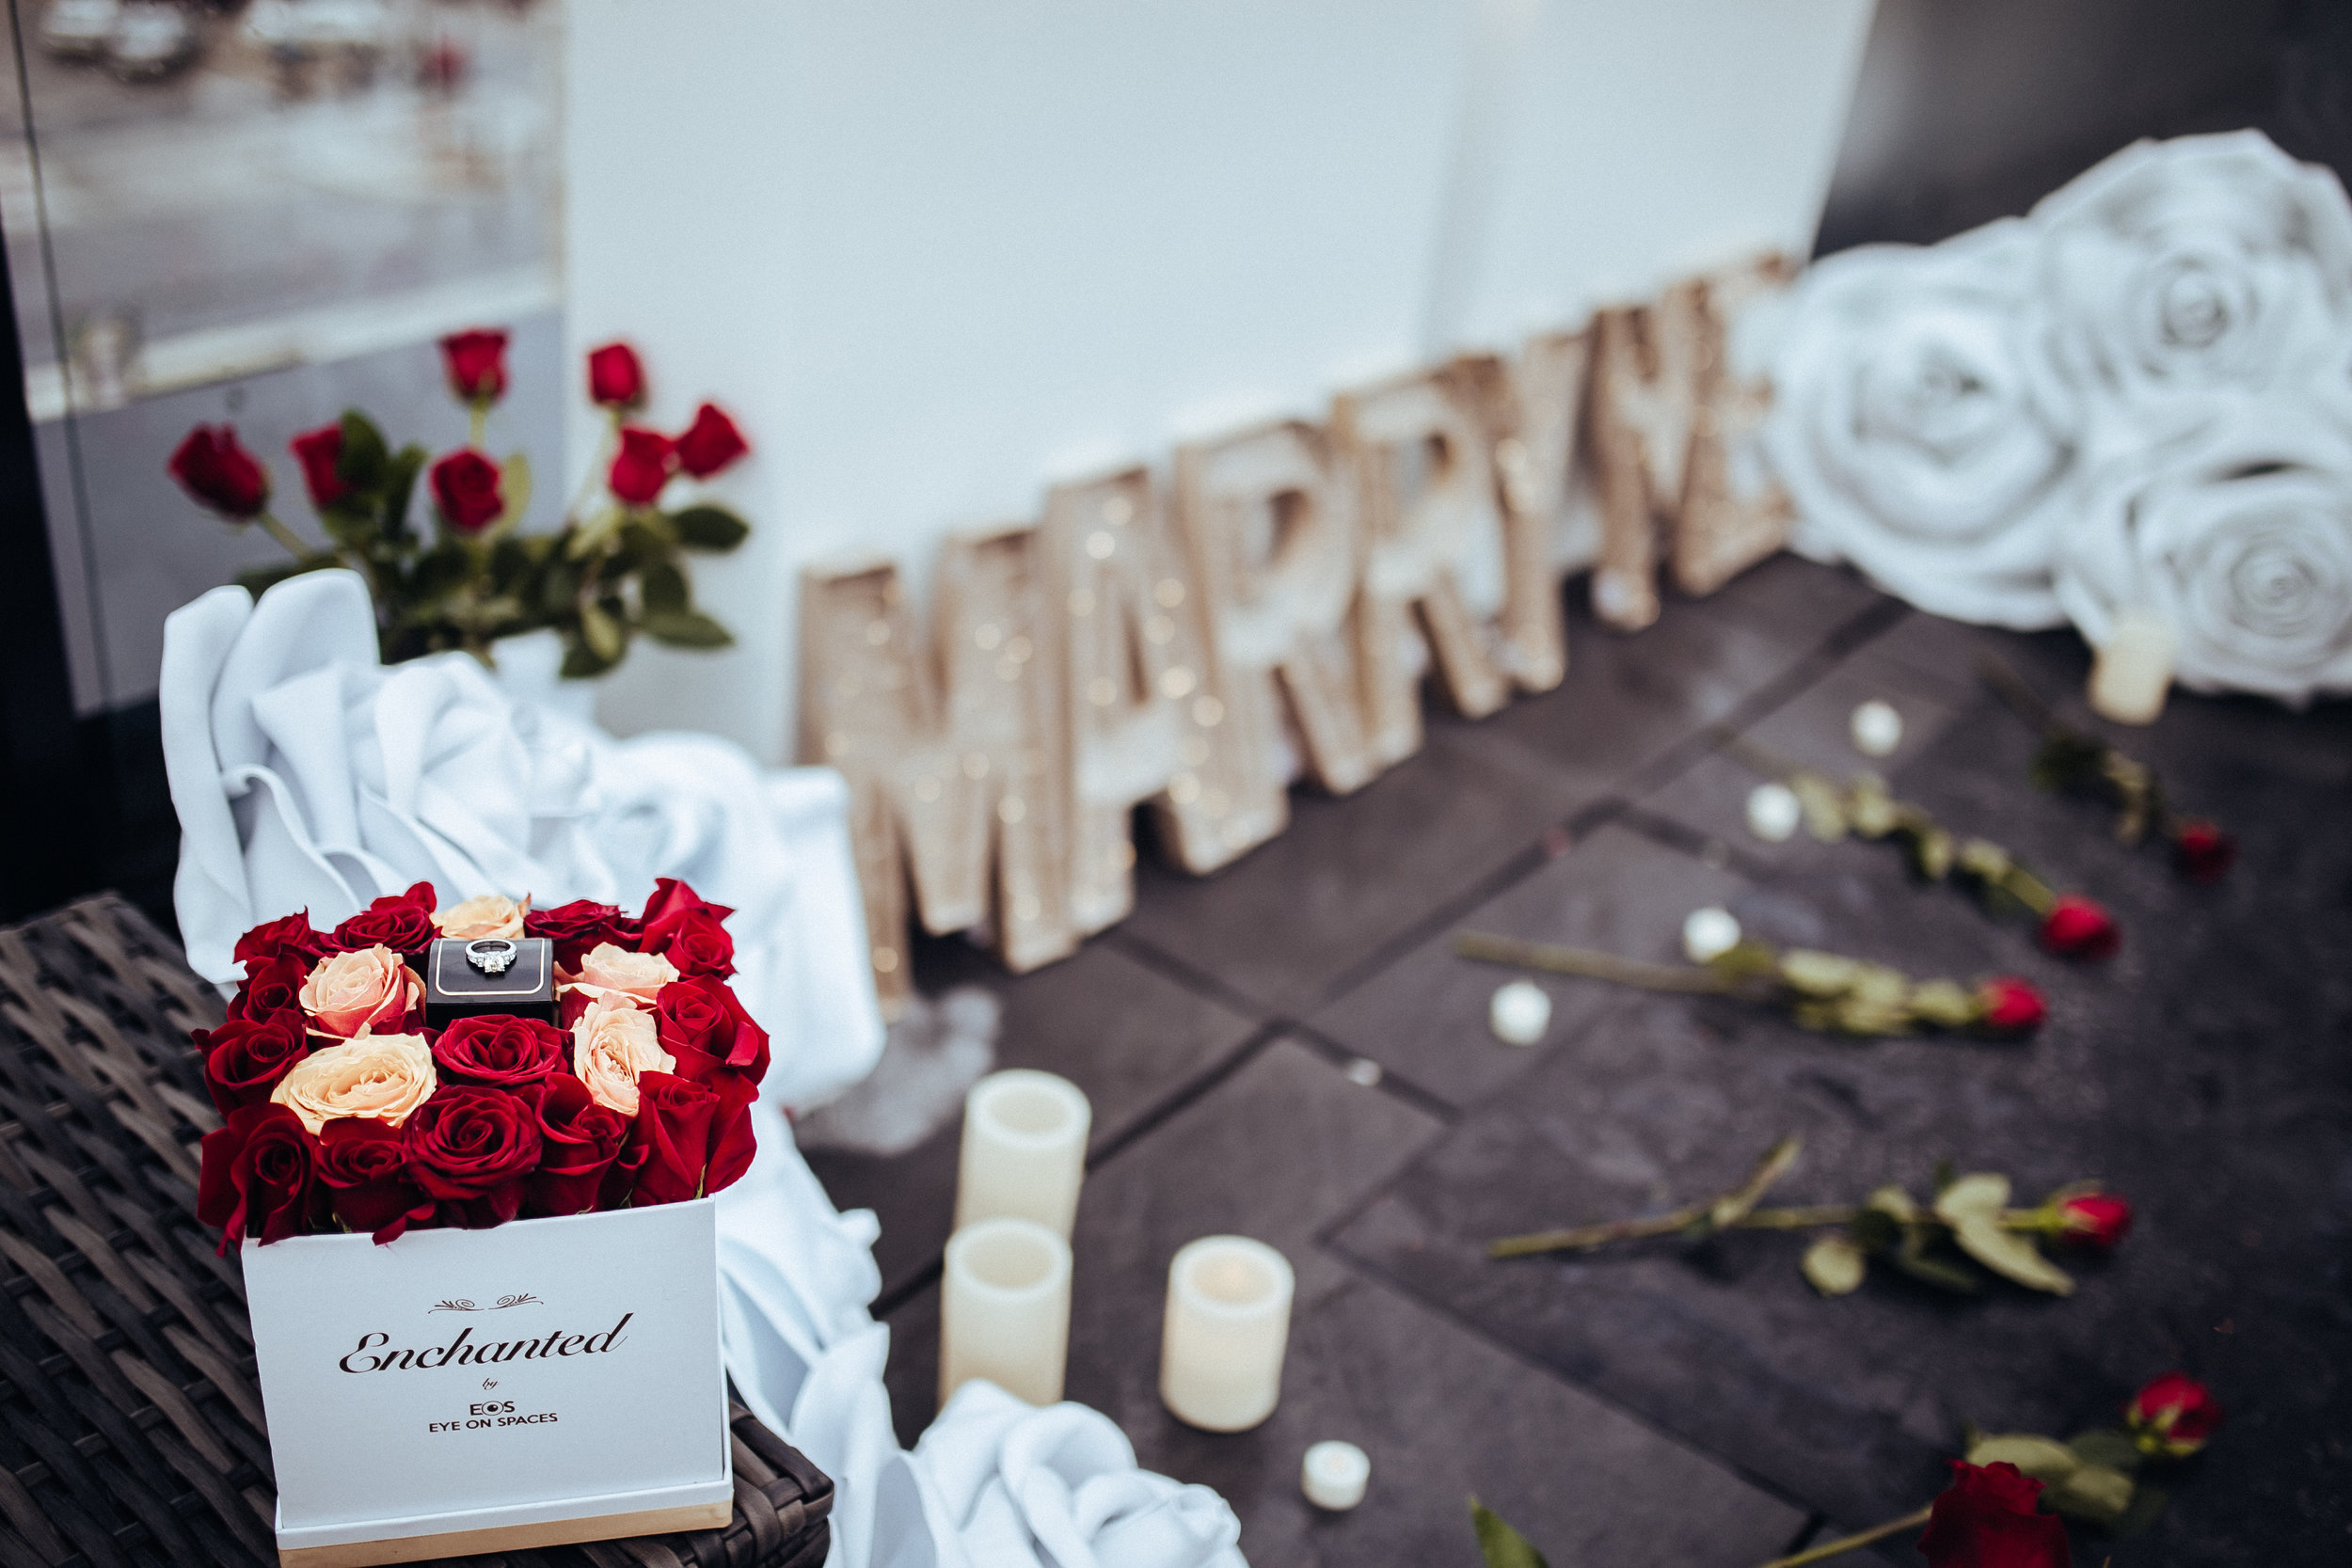 Enchanted_Proposal_2018-10.jpg